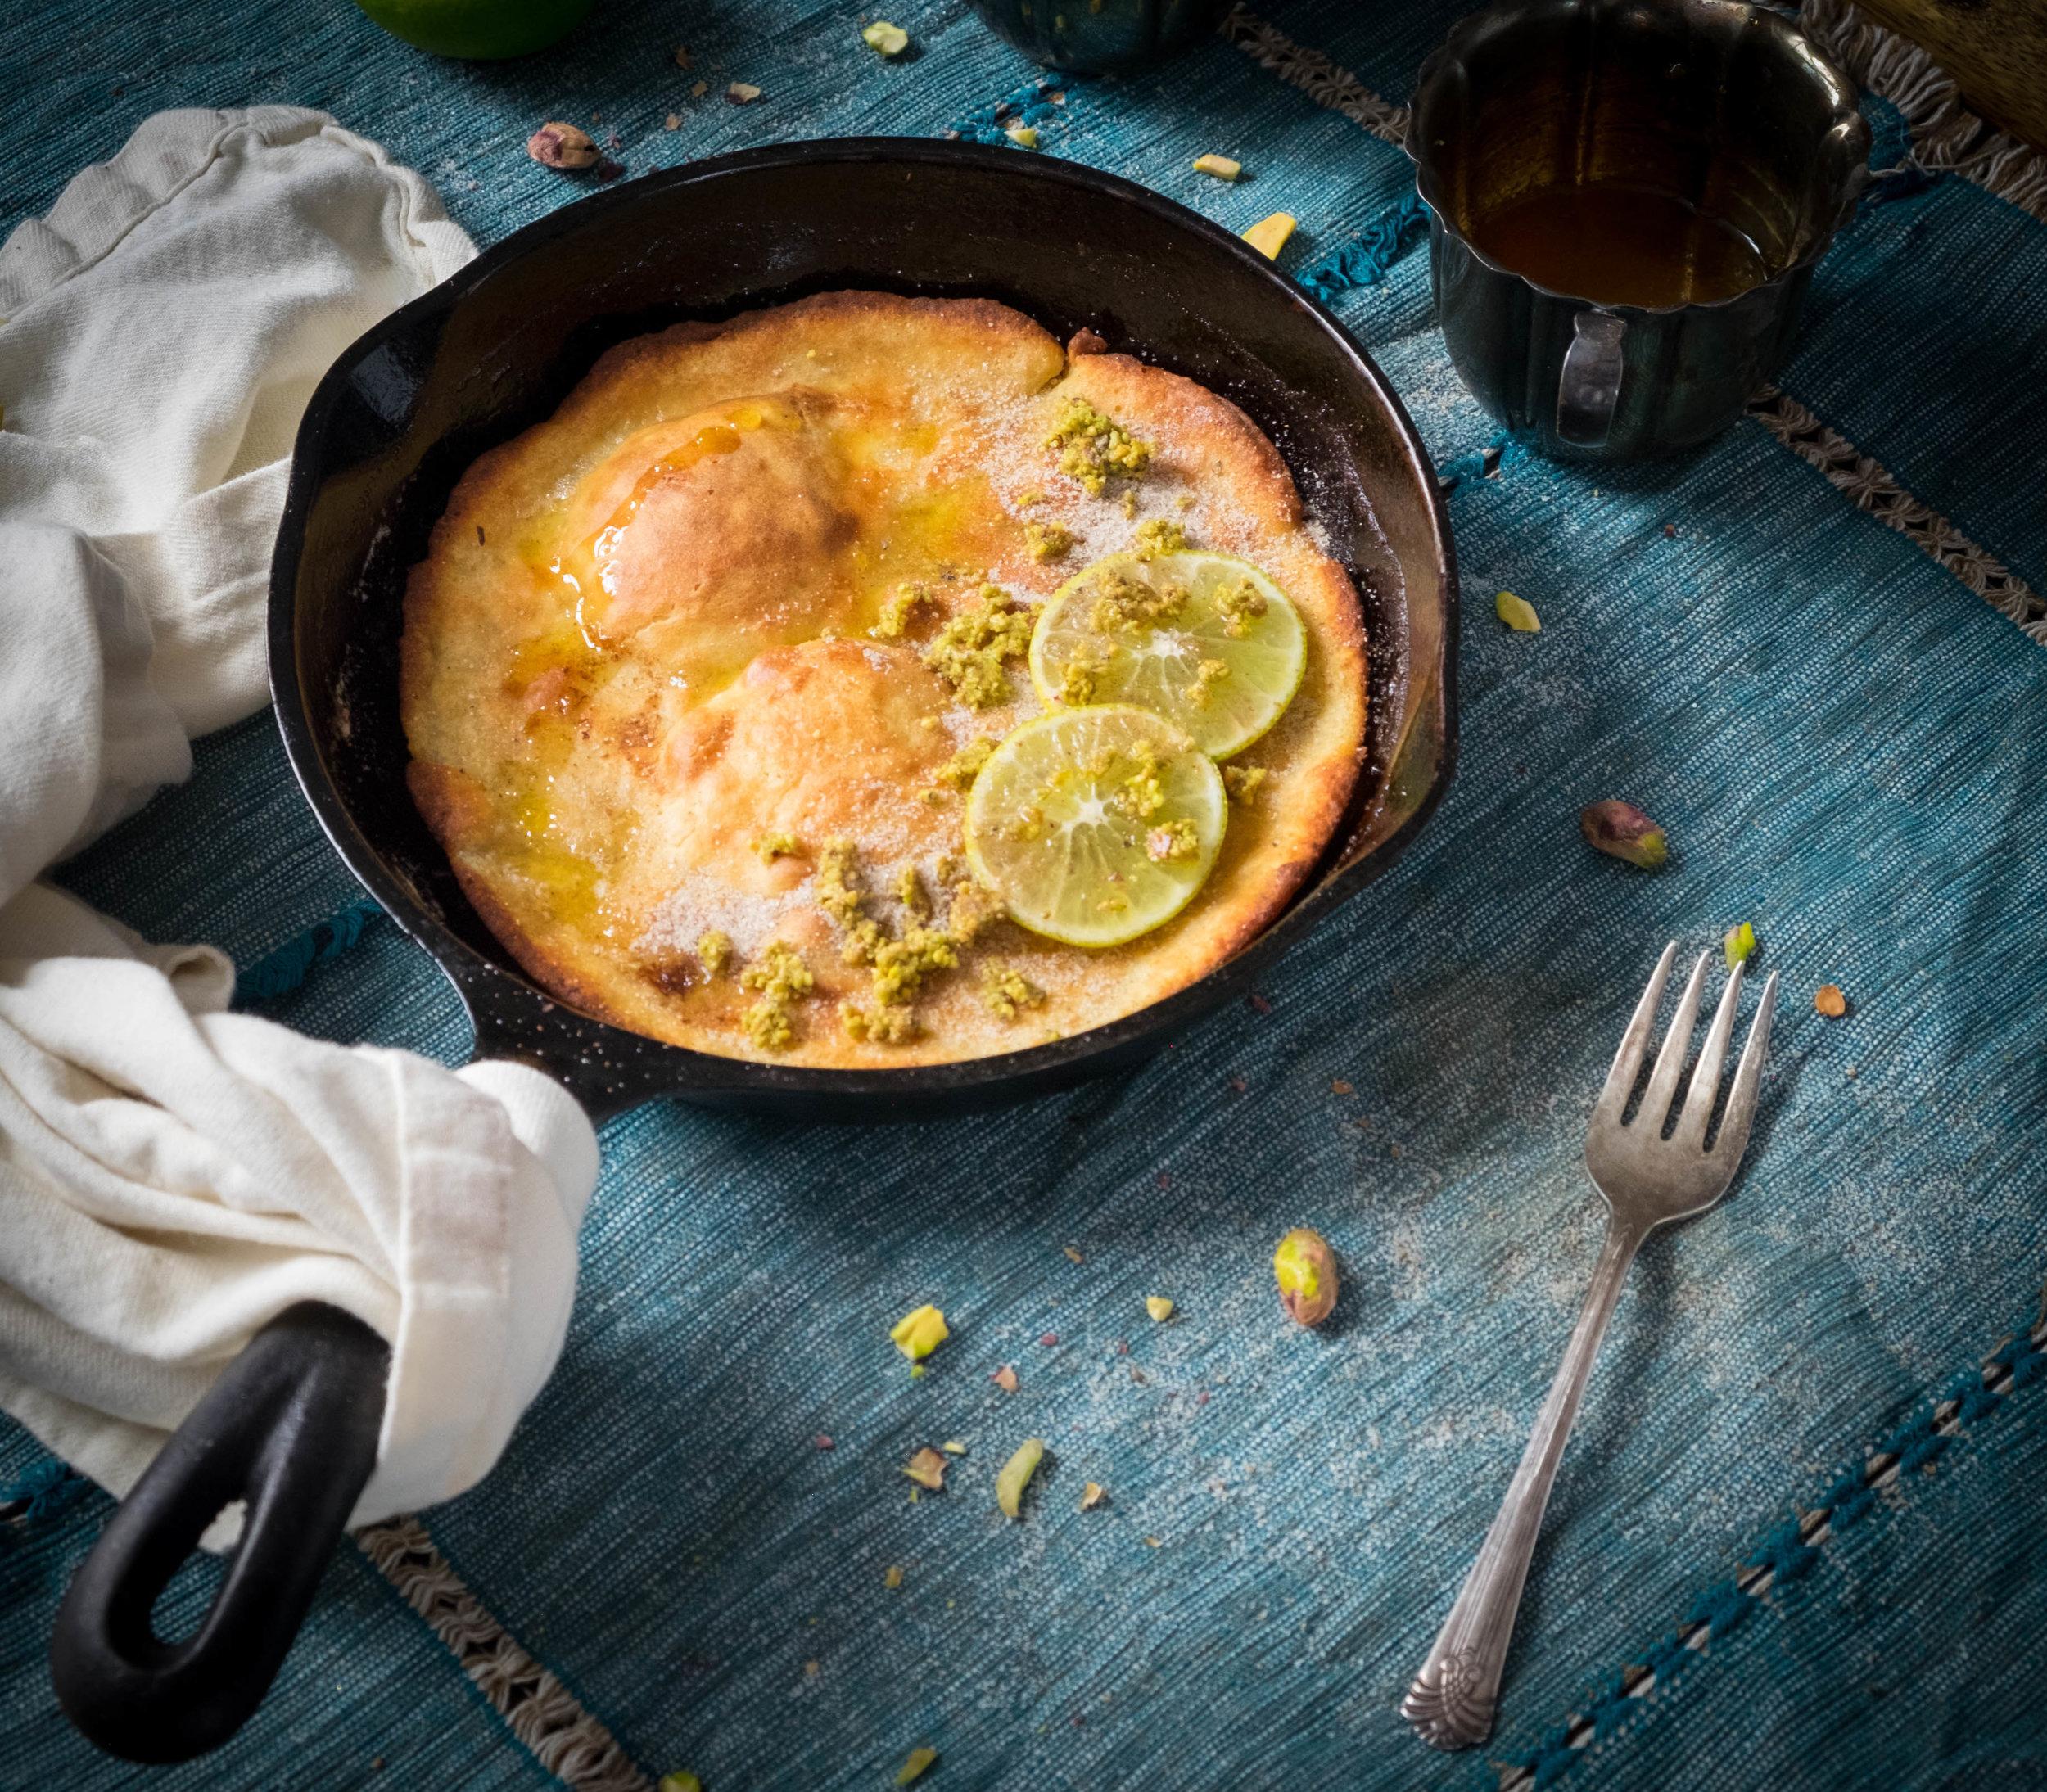 dutch-baby-oven-pancake-breakfast-cardamom-lime-pistachio